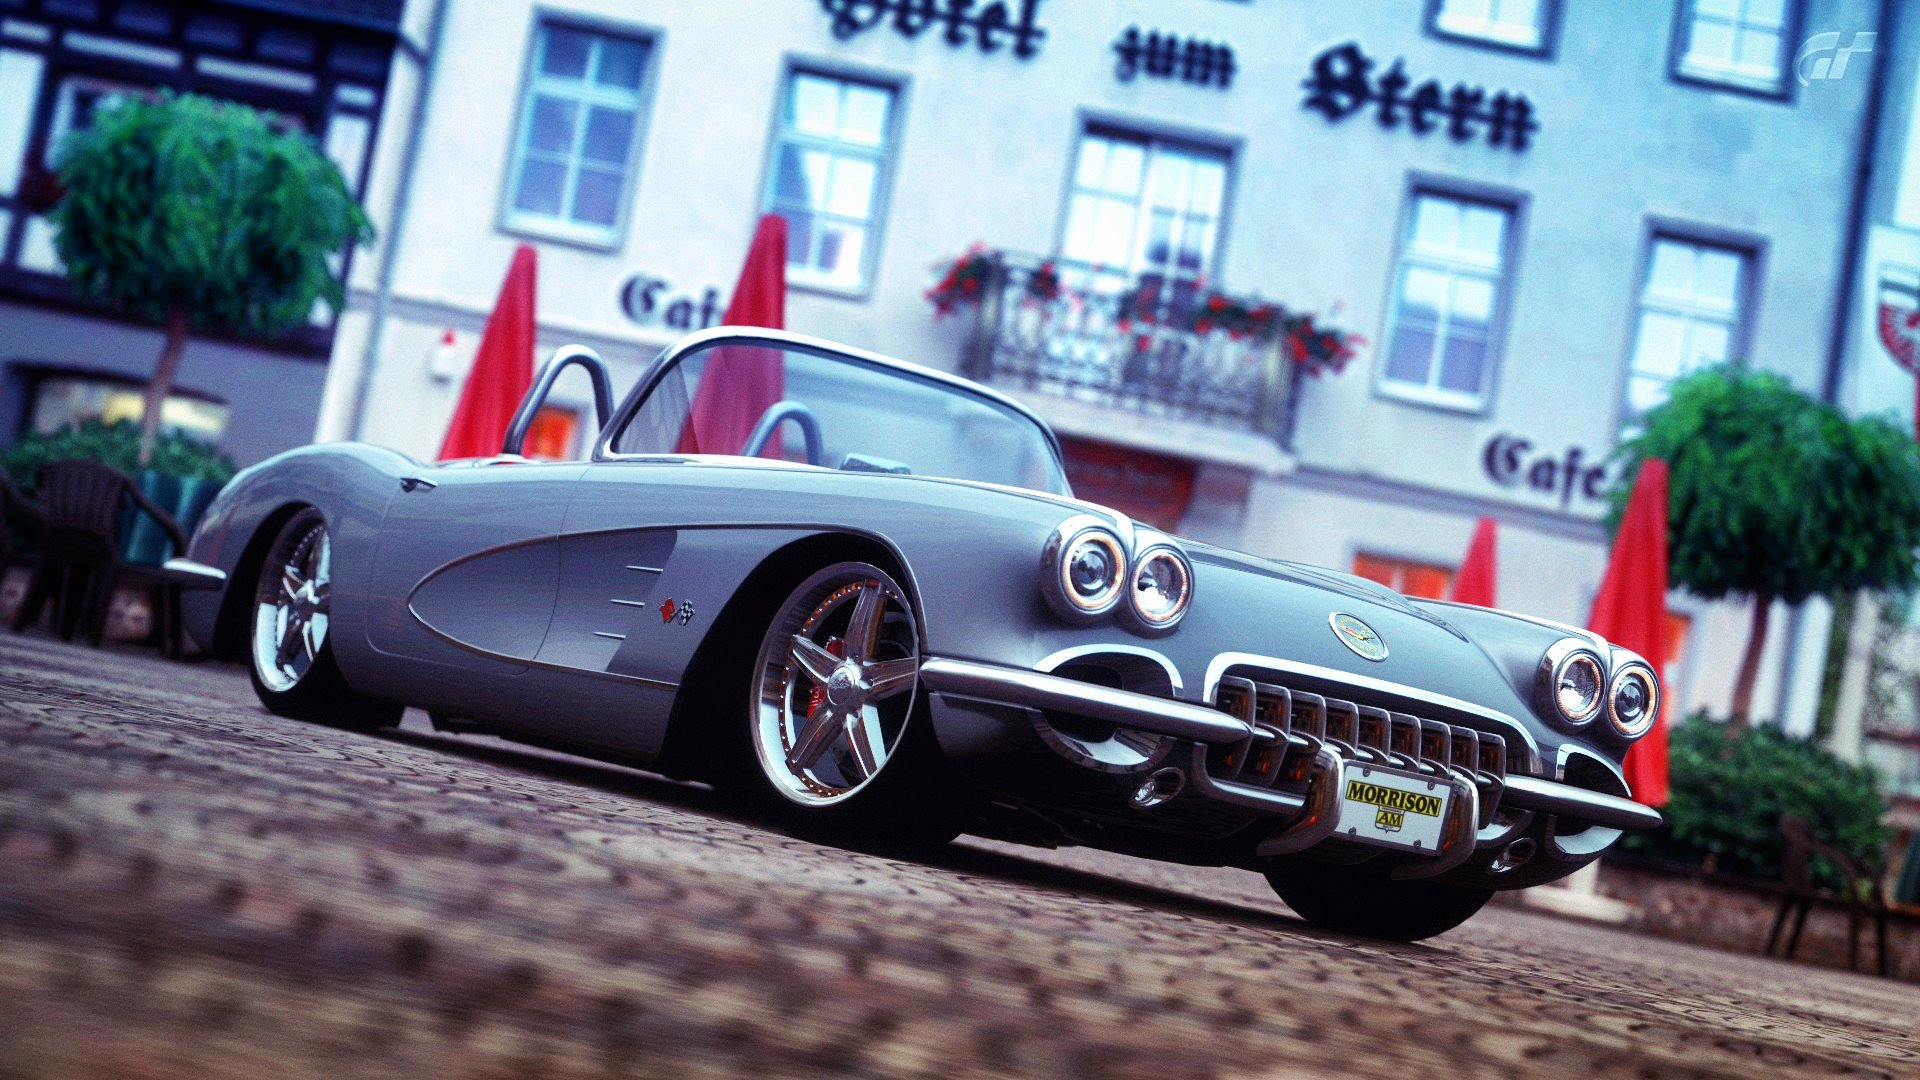 Chevrolet Corvette, HD Cars, 4k Wallpapers, Images